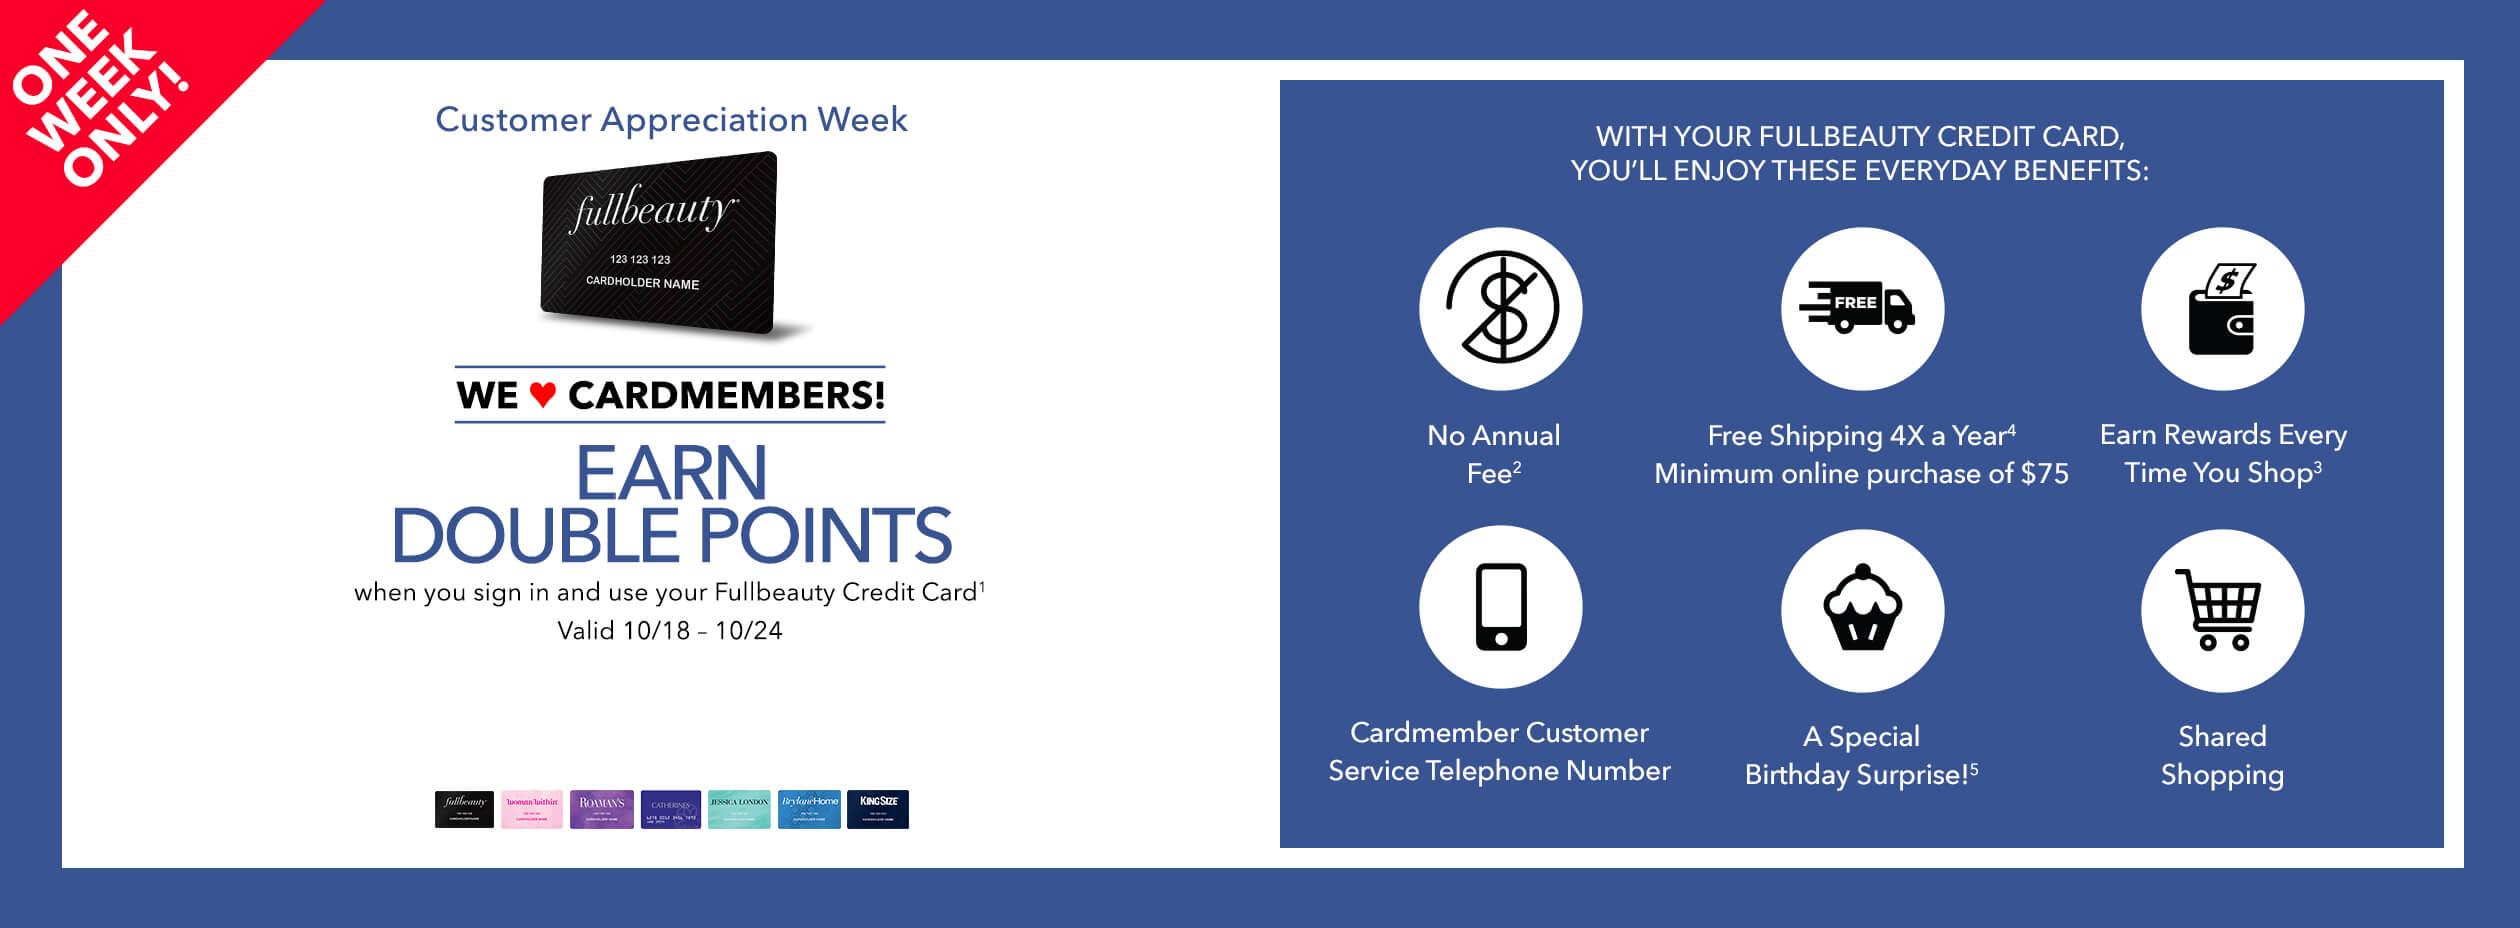 FullBeauty Credit Card double points